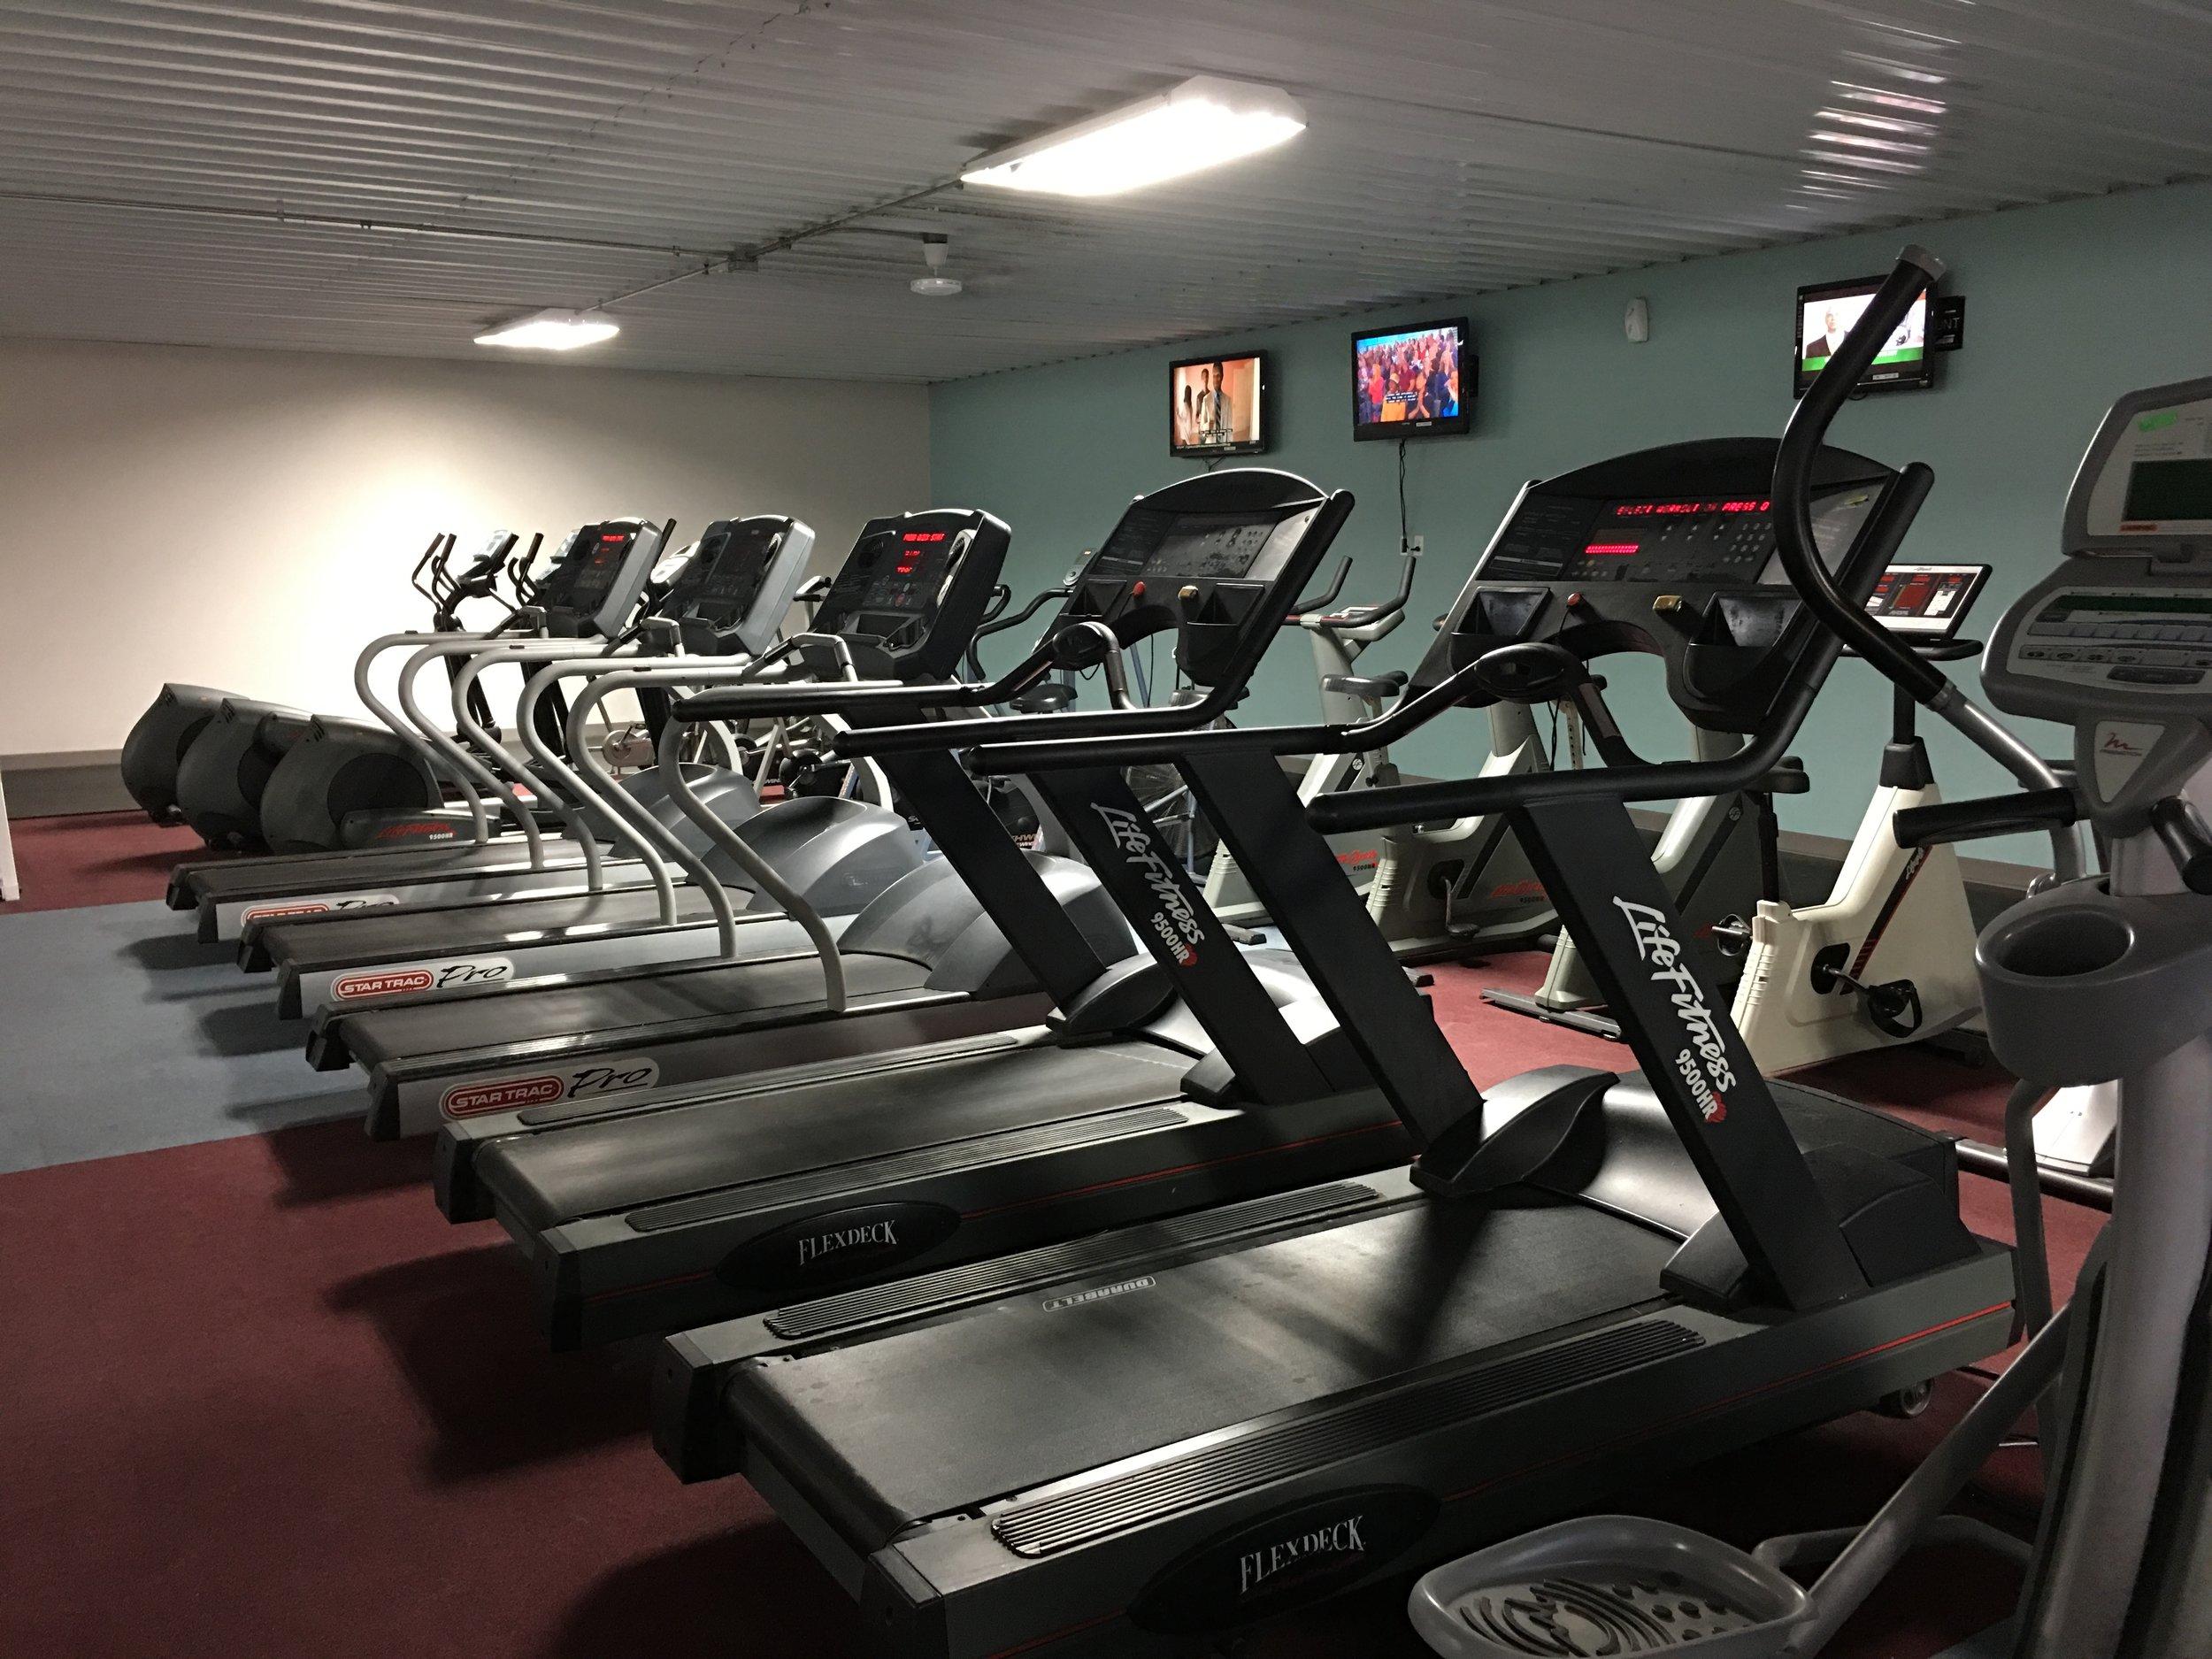 Treadmills in Cardio Area on 2nd Floor